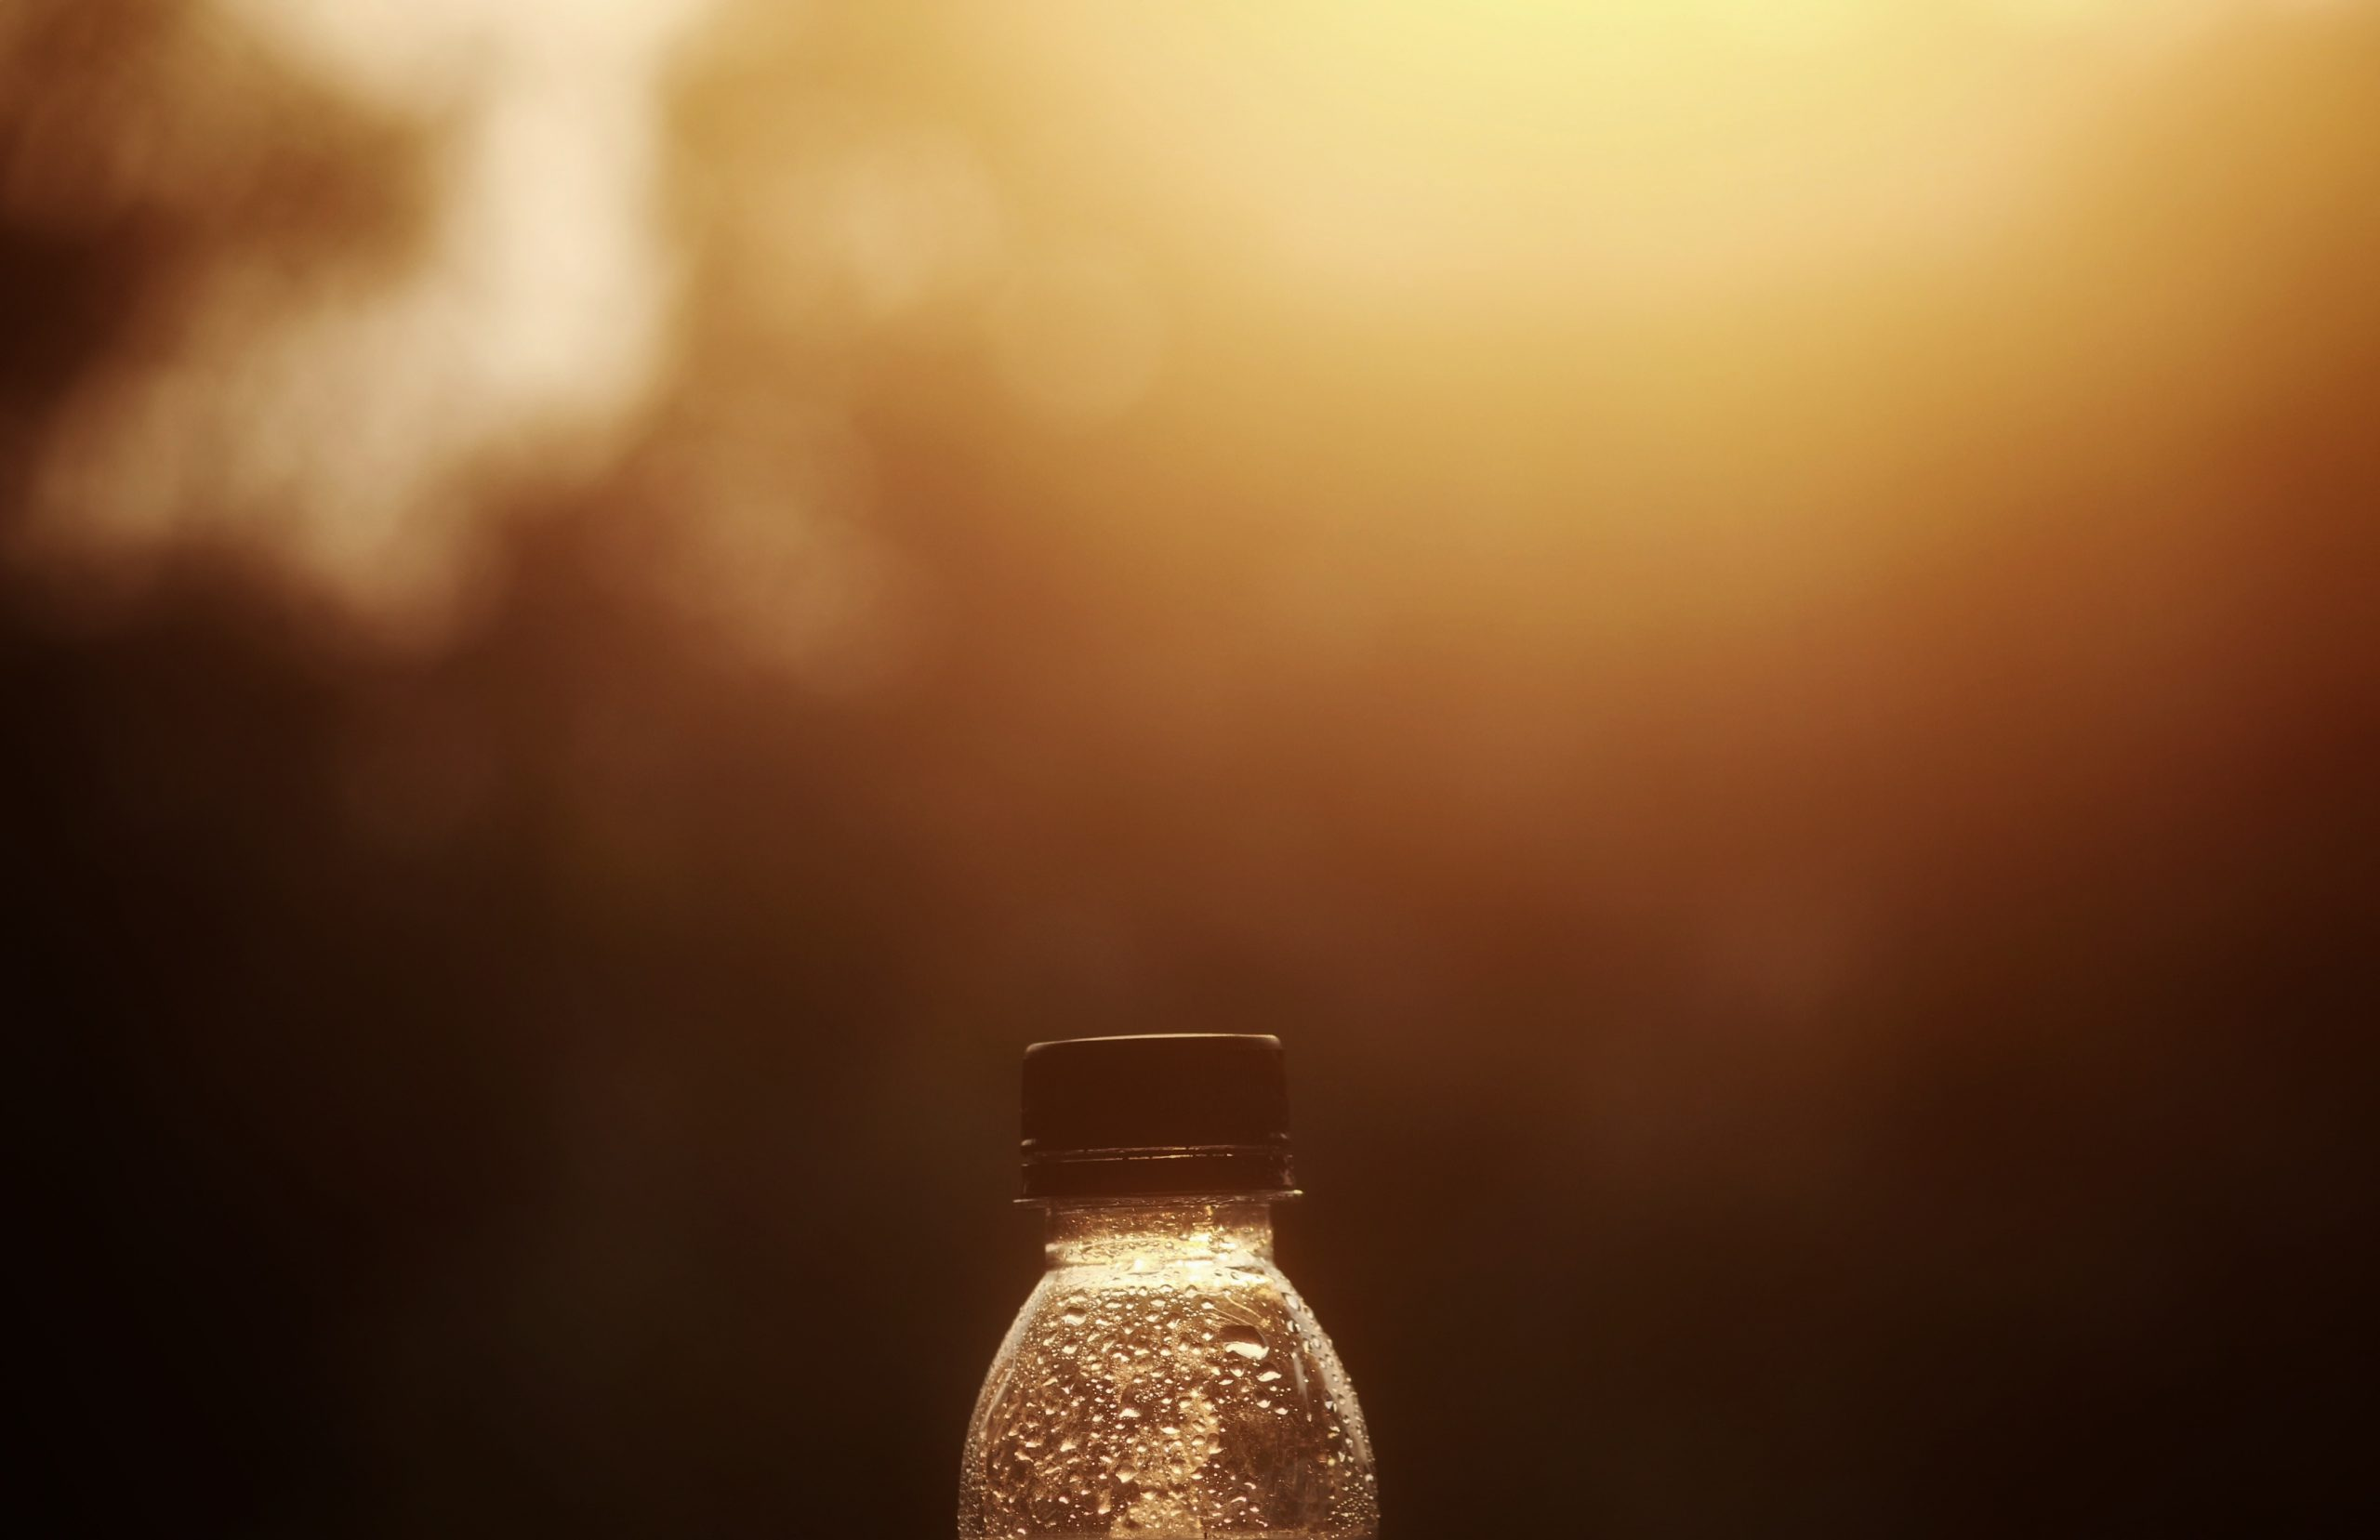 Drops on Plastic bottle